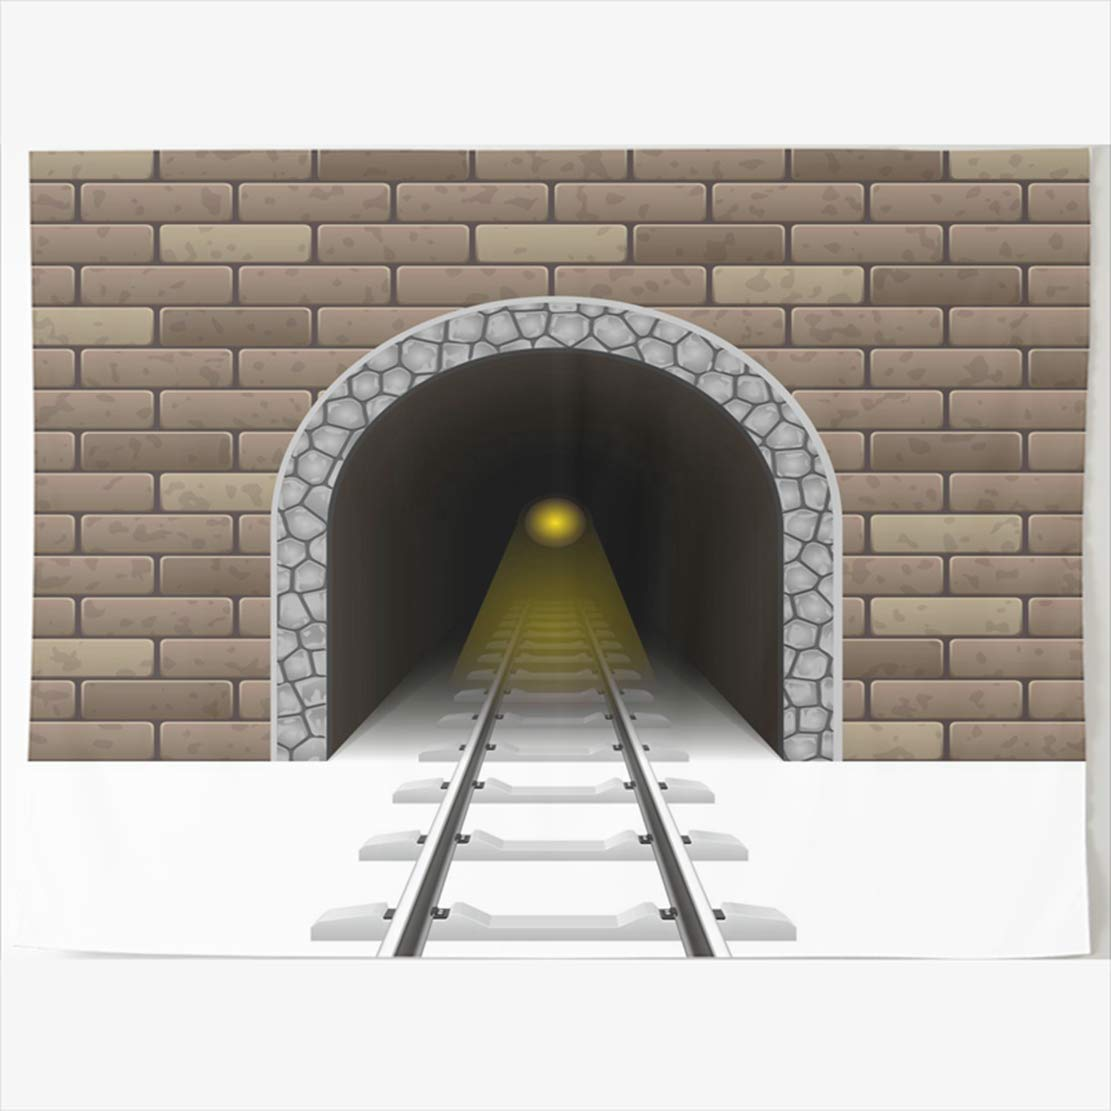 DIYCow タペストリー 壁装飾 60 x 50インチ ボヘミアン柄 カラードヘッド フクロウ ブラック エスニック ヴィンテージデザイン タペストリー 壁吊りホームインテリア ホームオフィス 寝室 80